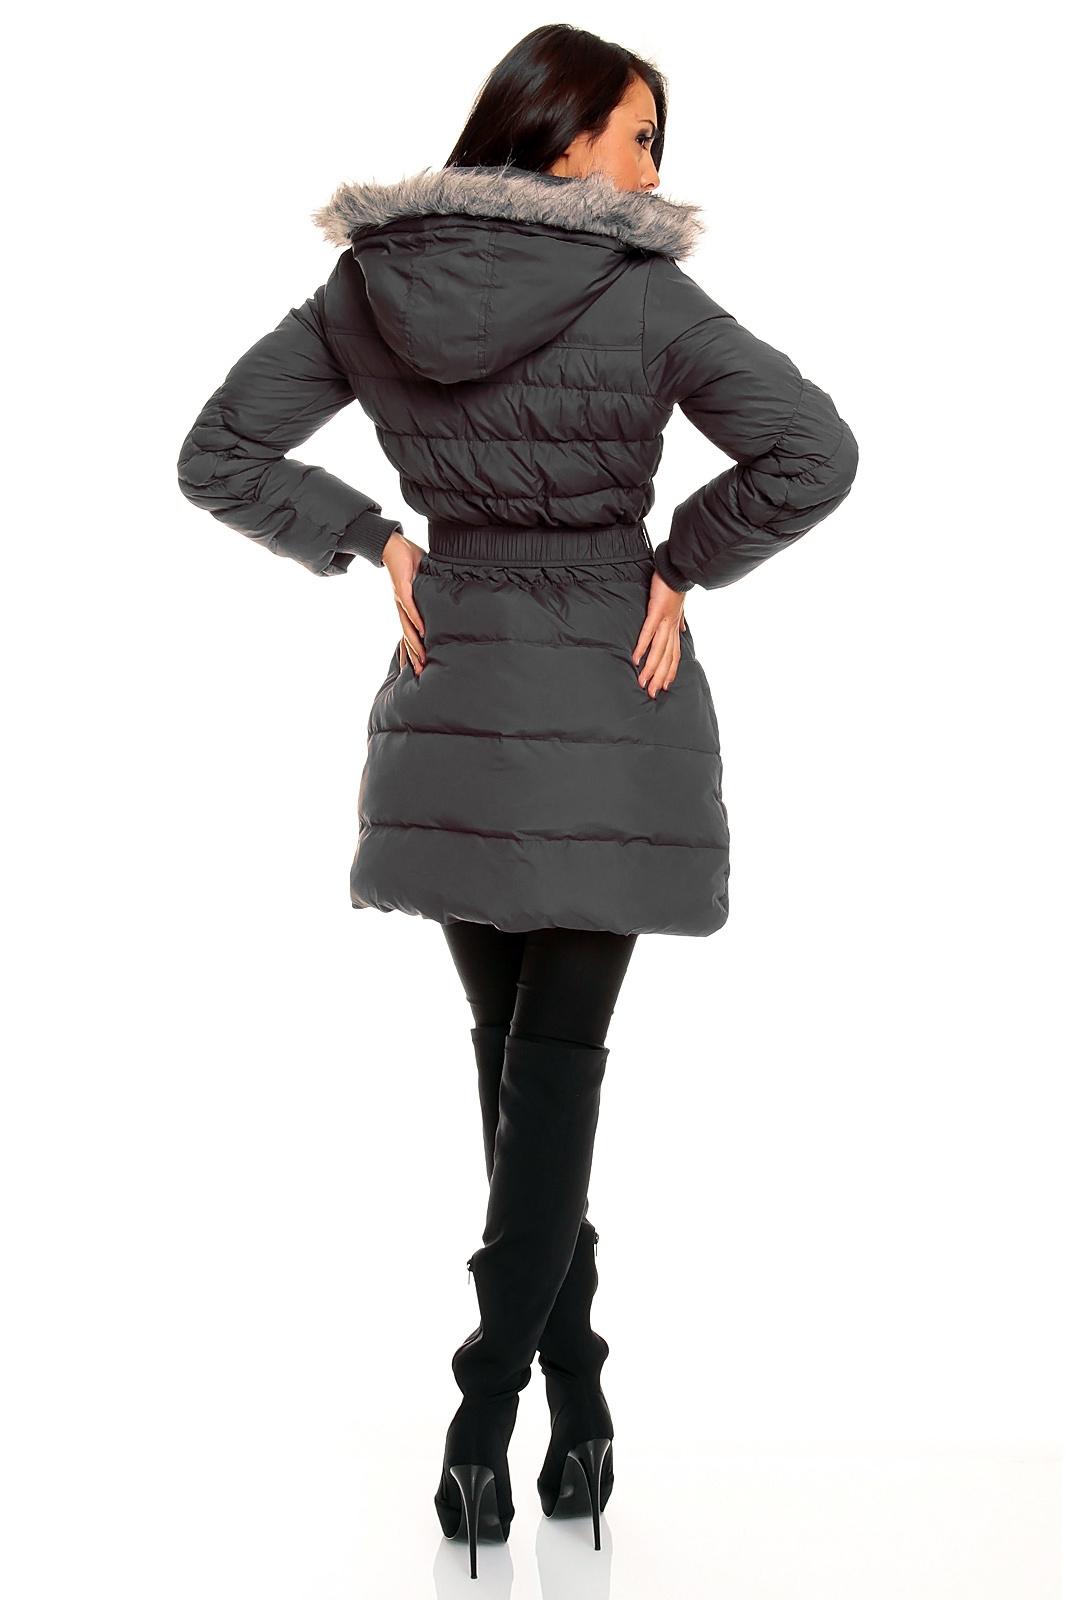 fresh made daunen steppmantel mantel wintermantel steppjacke mit kapuze ebay. Black Bedroom Furniture Sets. Home Design Ideas